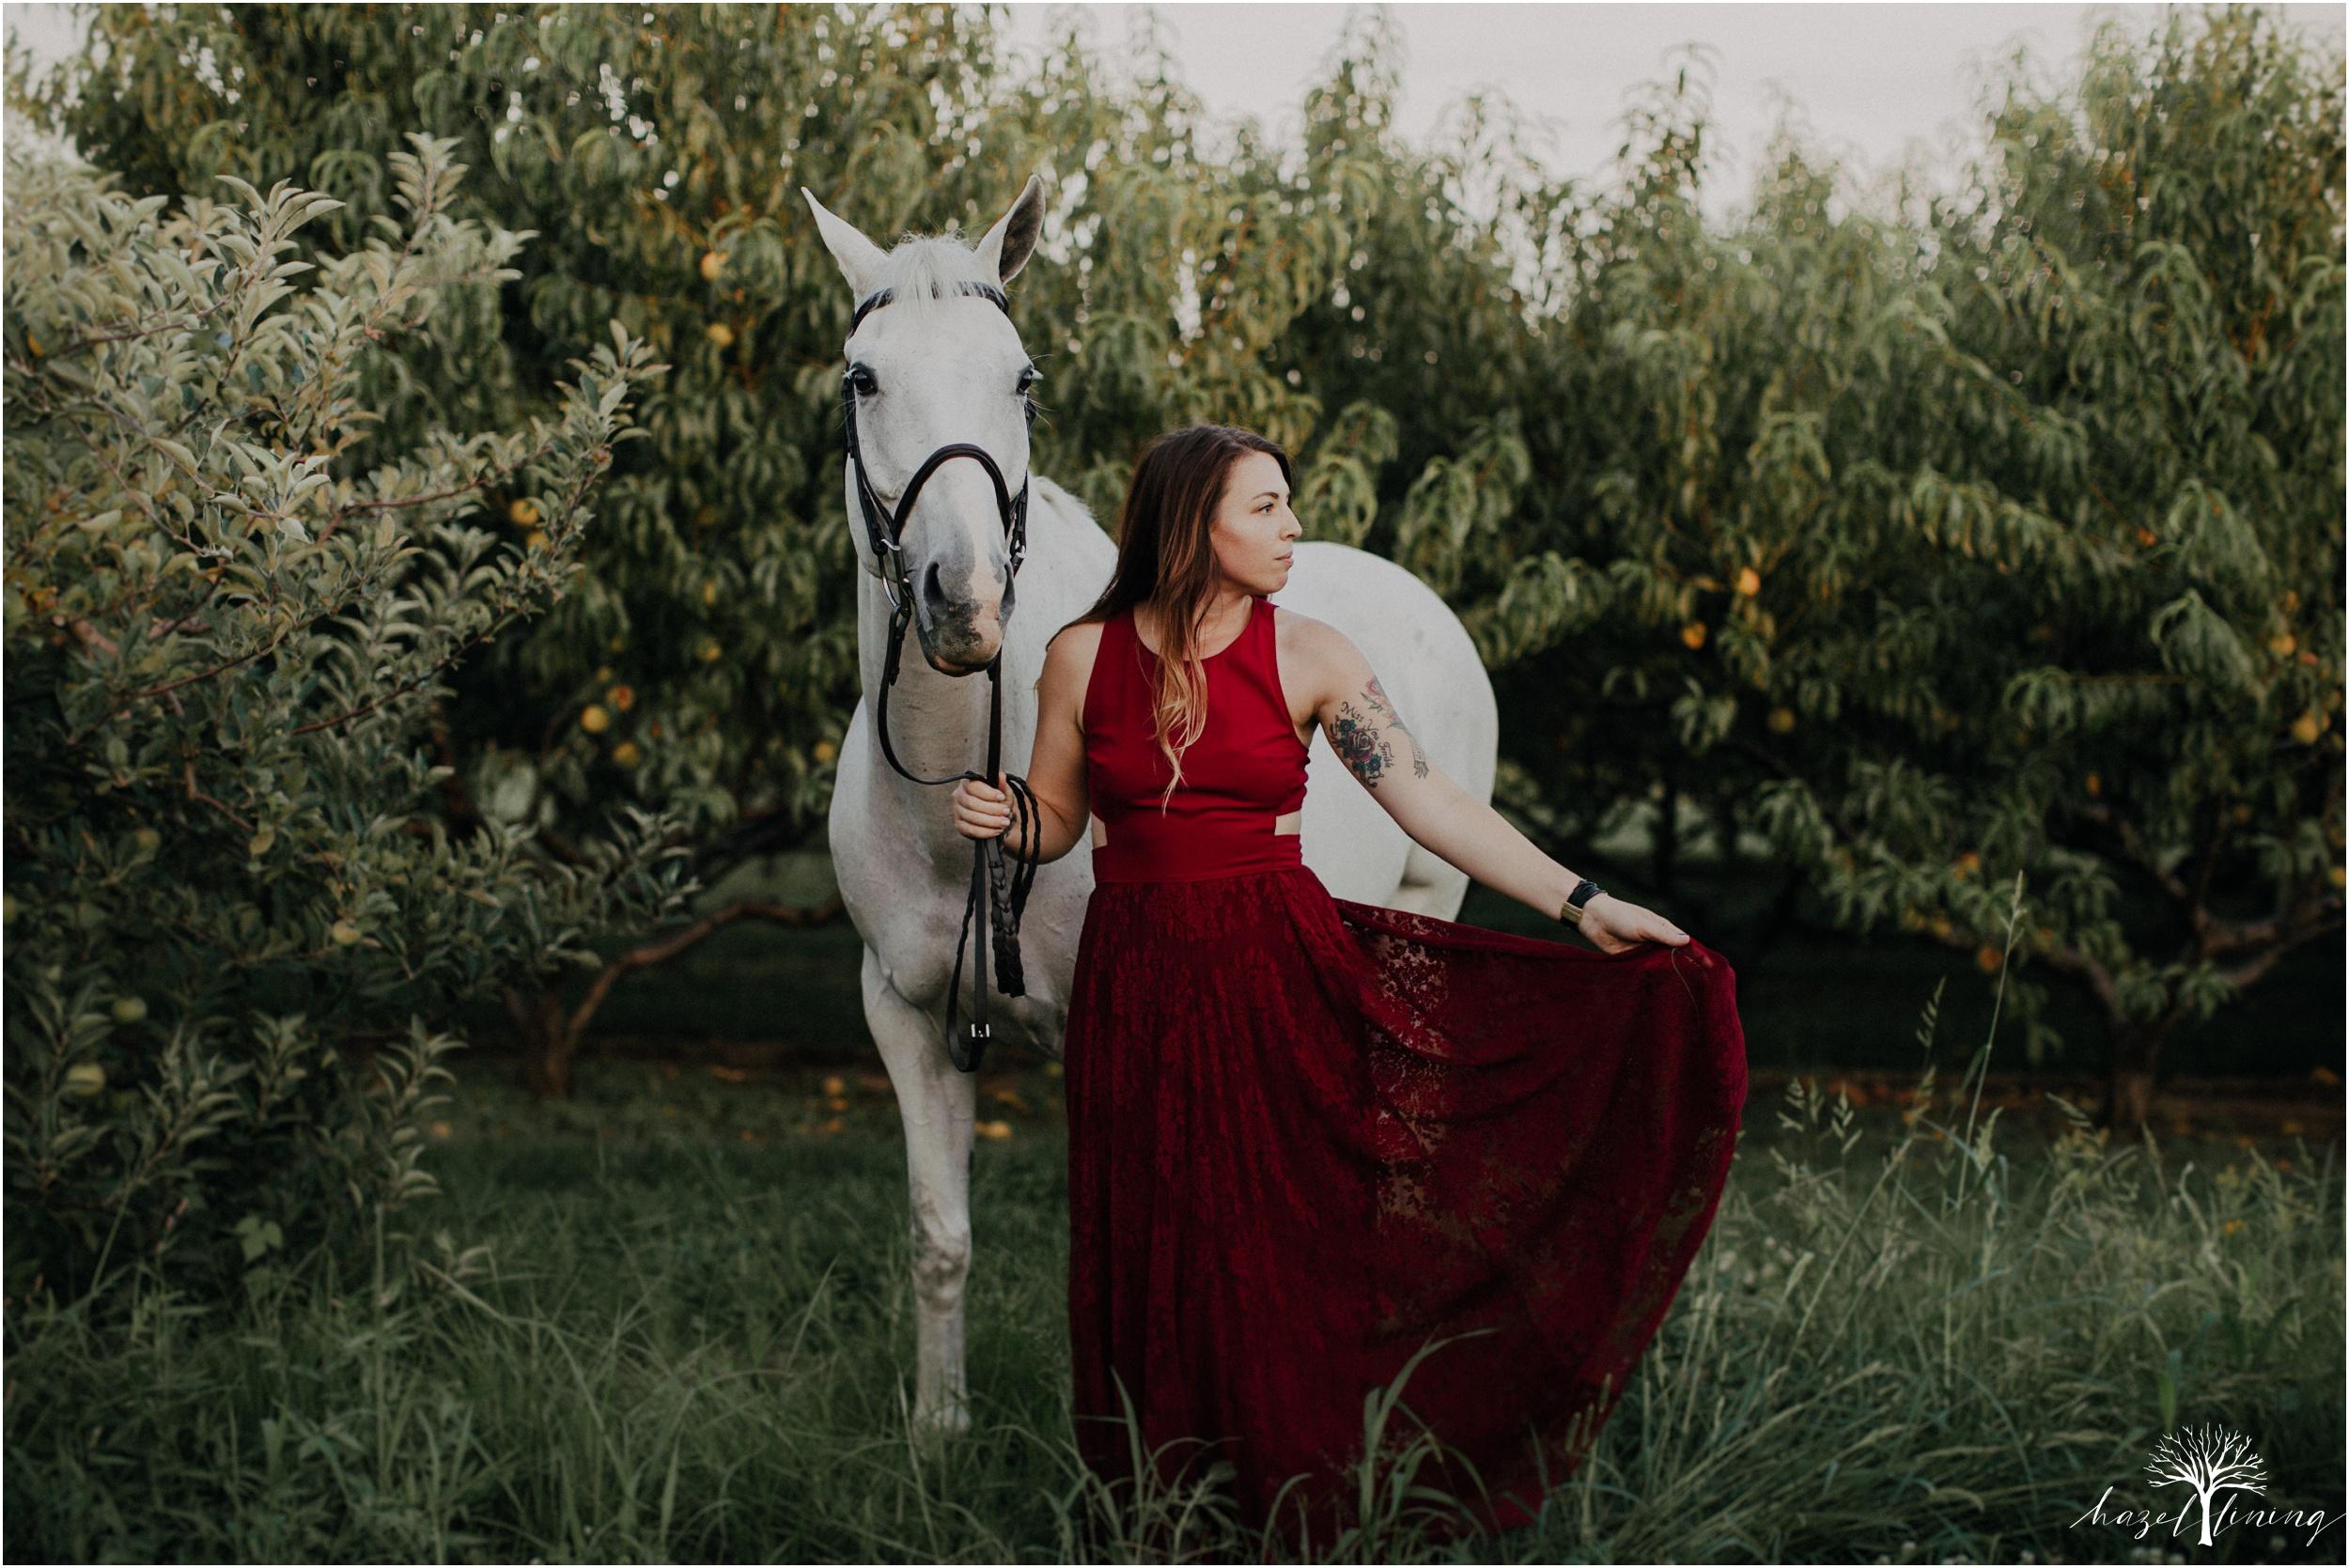 taylor-adams-and-horse-delaware-valley-university-delval-summer-equestrian-portrait-session-hazel-lining-photography-destination-elopement-wedding-engagement-photography_0047.jpg